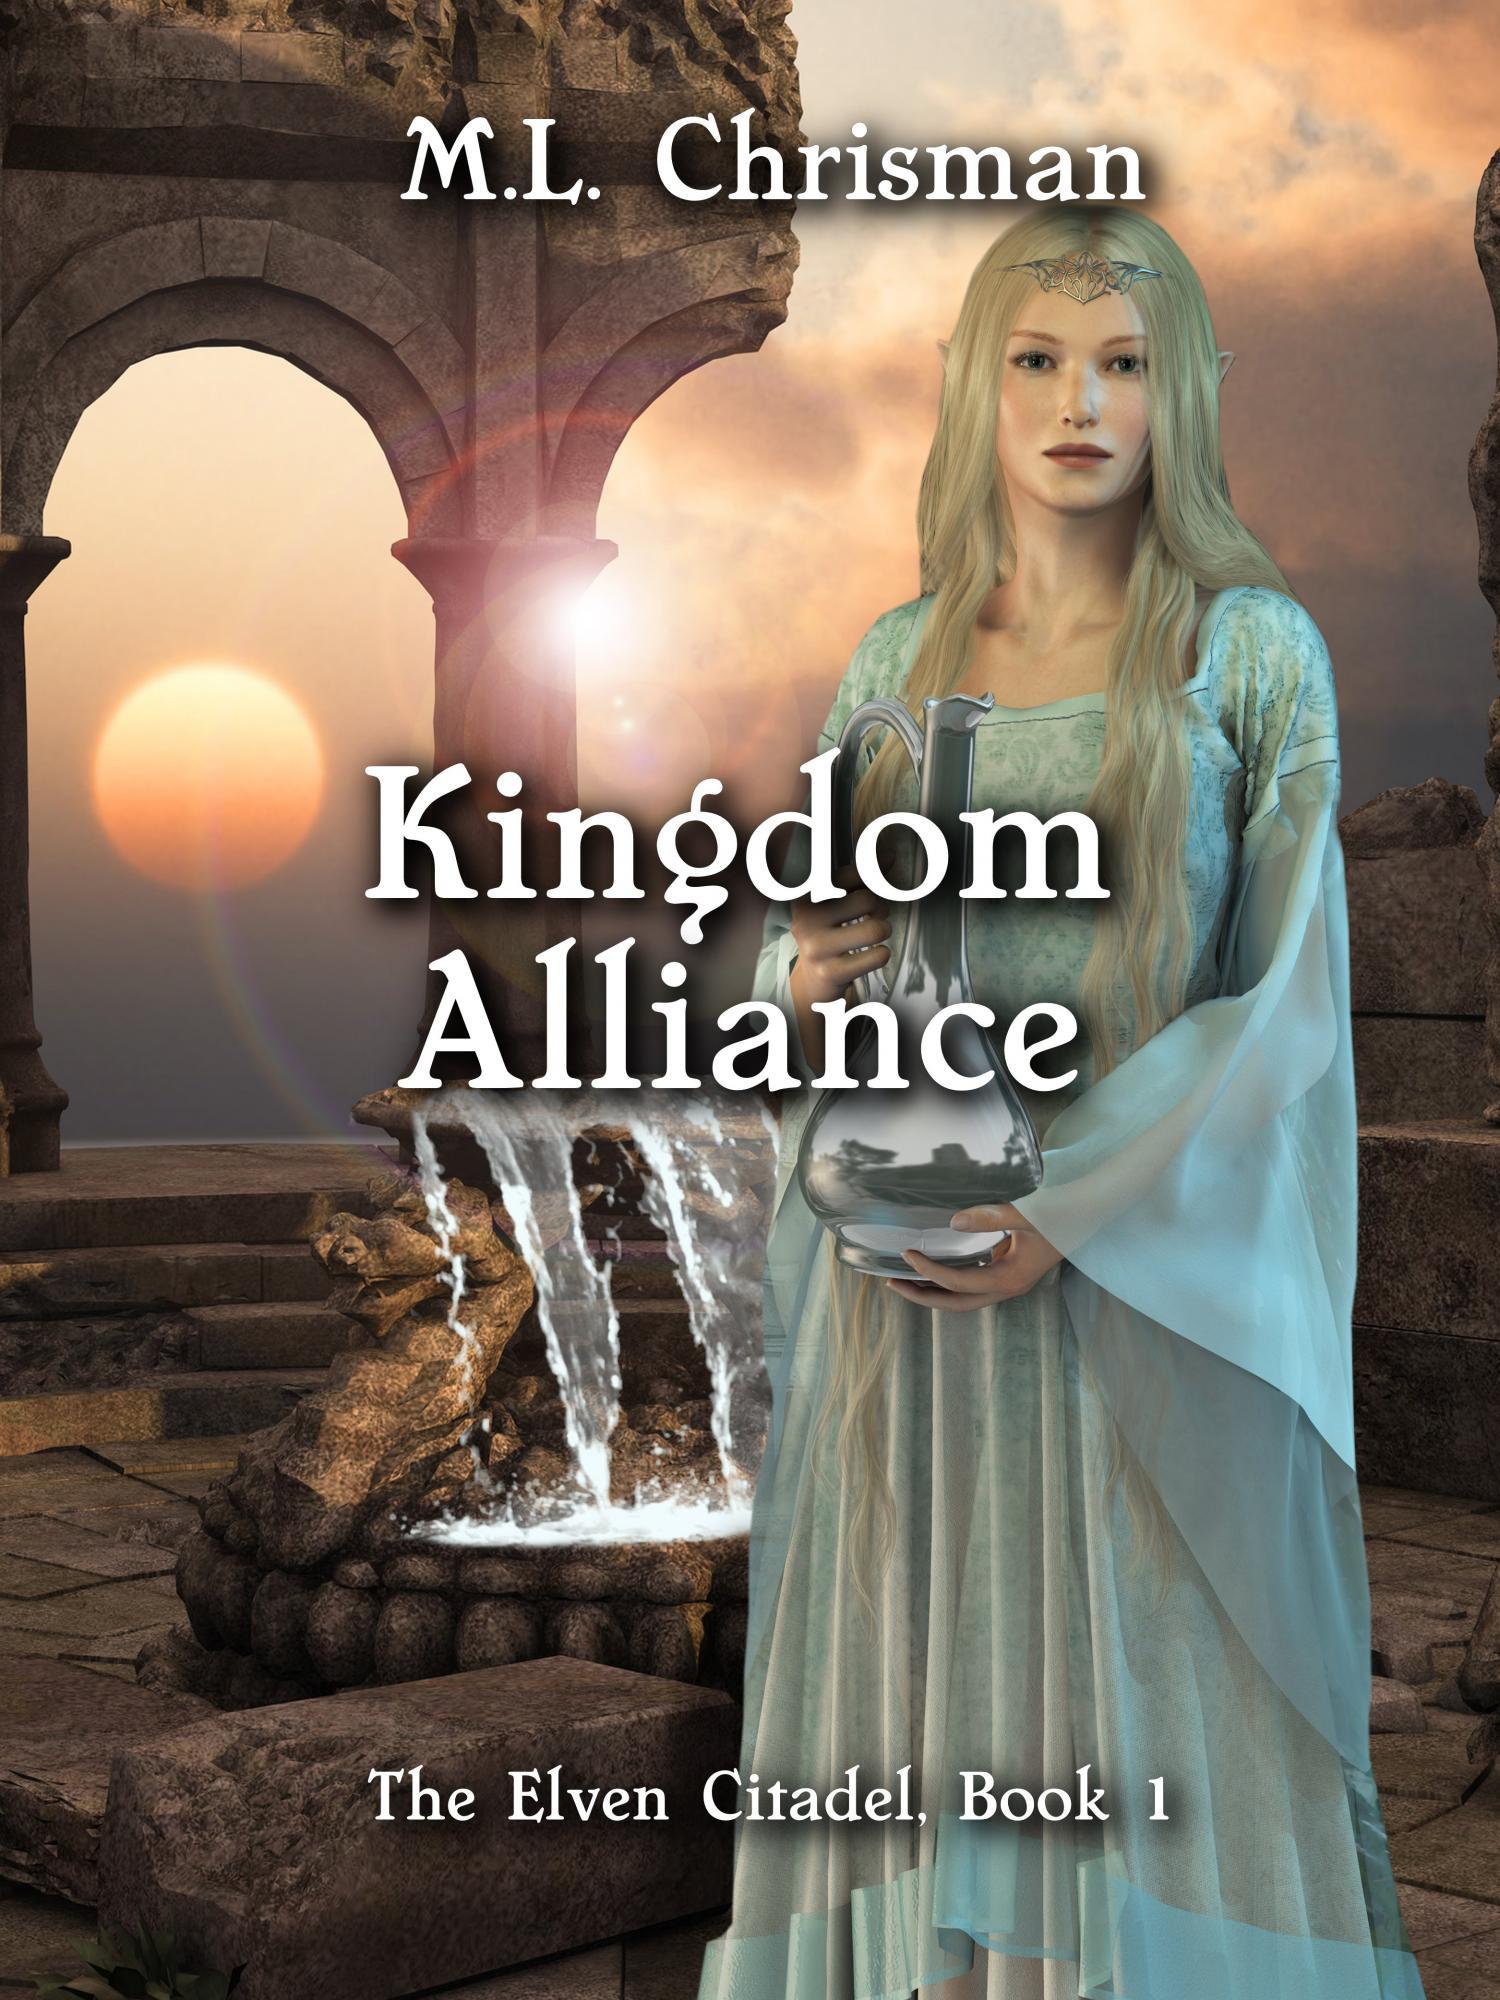 Kingdom Alliance (The Elven Citadel, Book 1) M.L. Chrisman